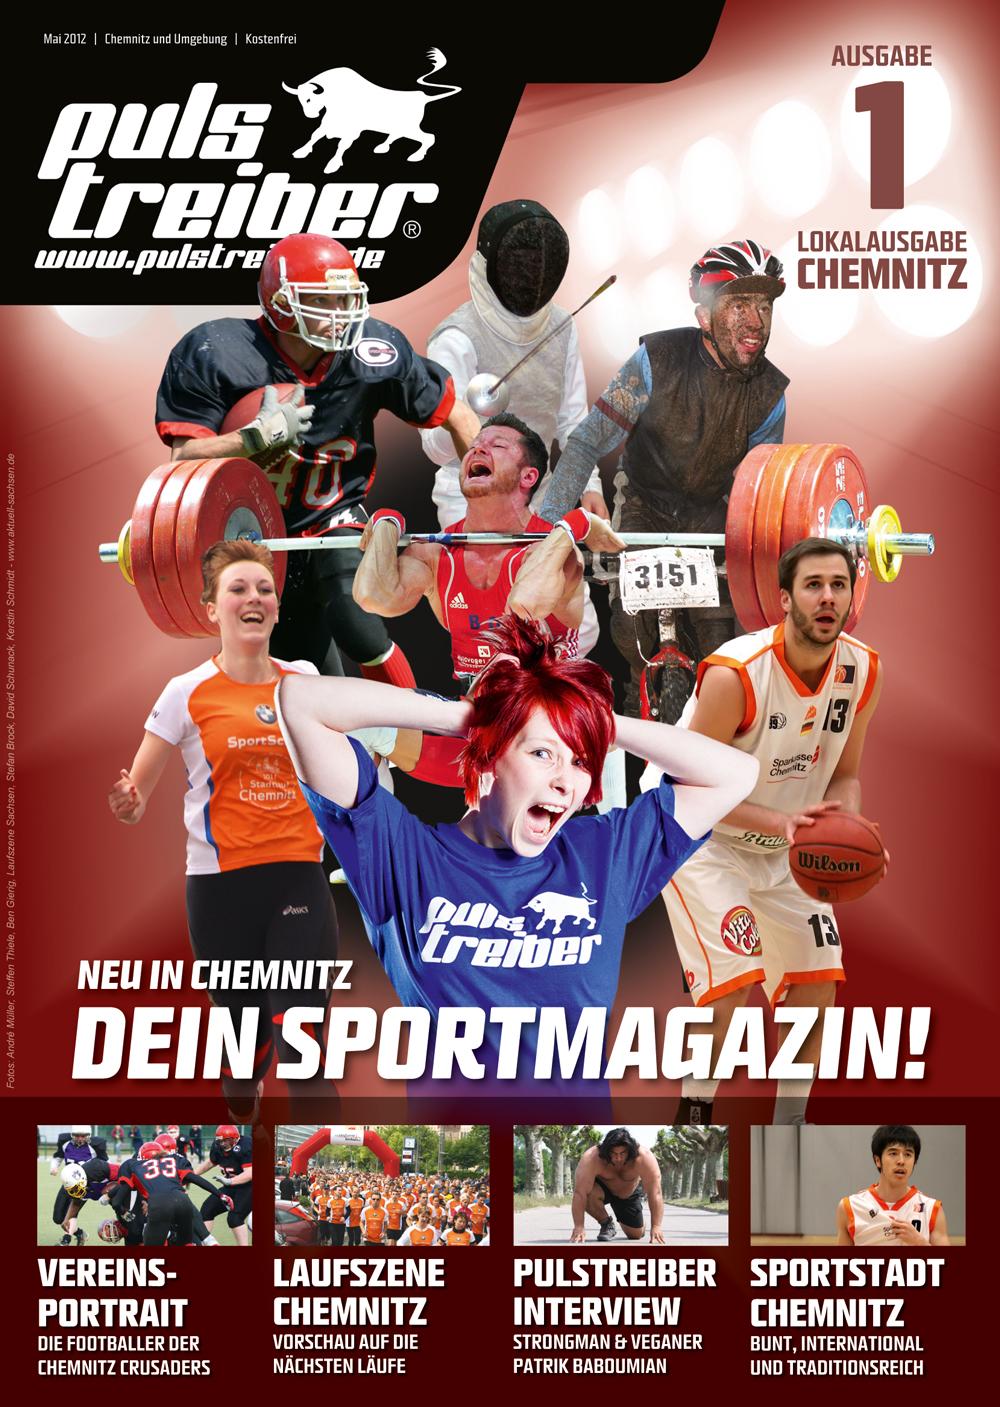 Ausgabe Chemnitz